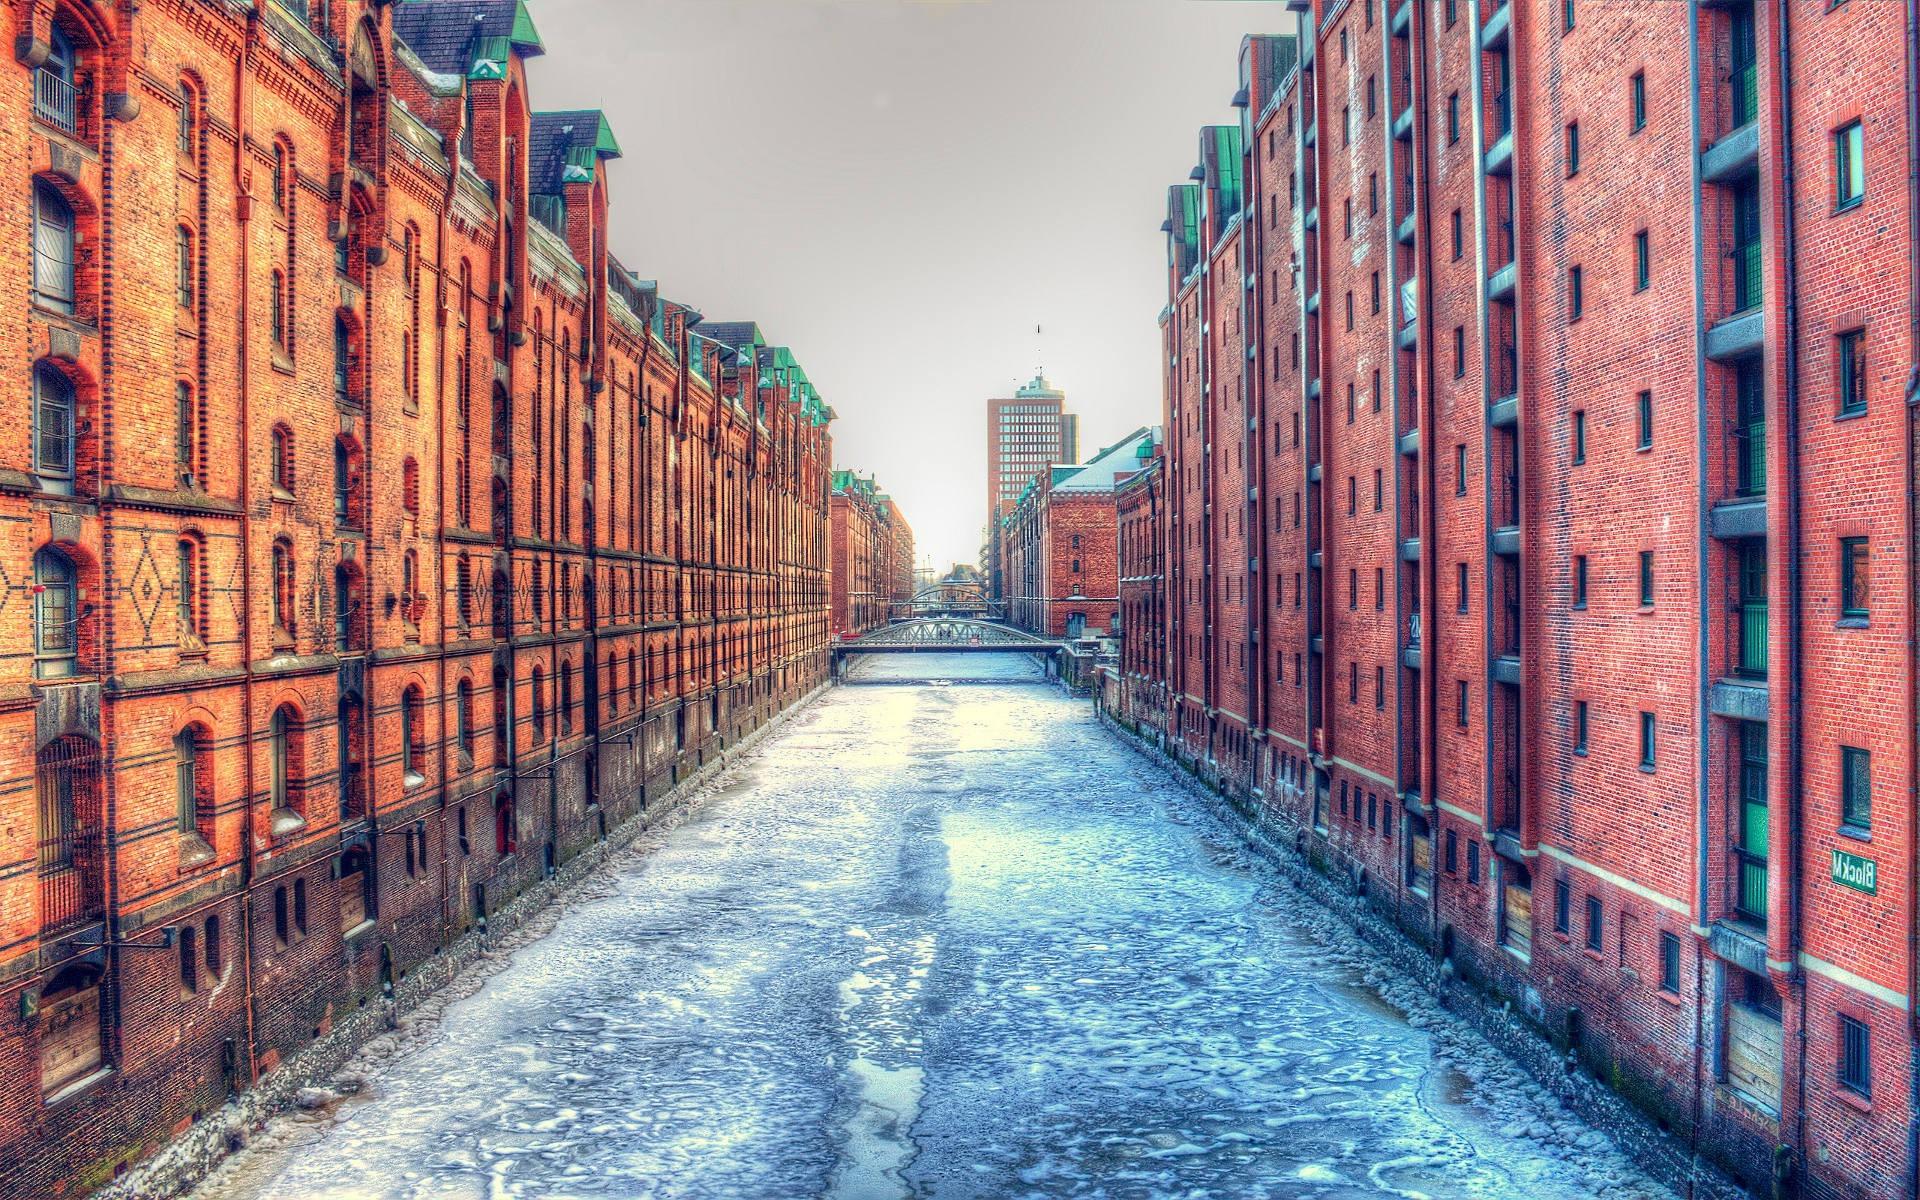 1920x1200 Px Architecture Bricks Bridge Building City Cityscape Dock Frozen River Germany Hamburg HDR Ice Old